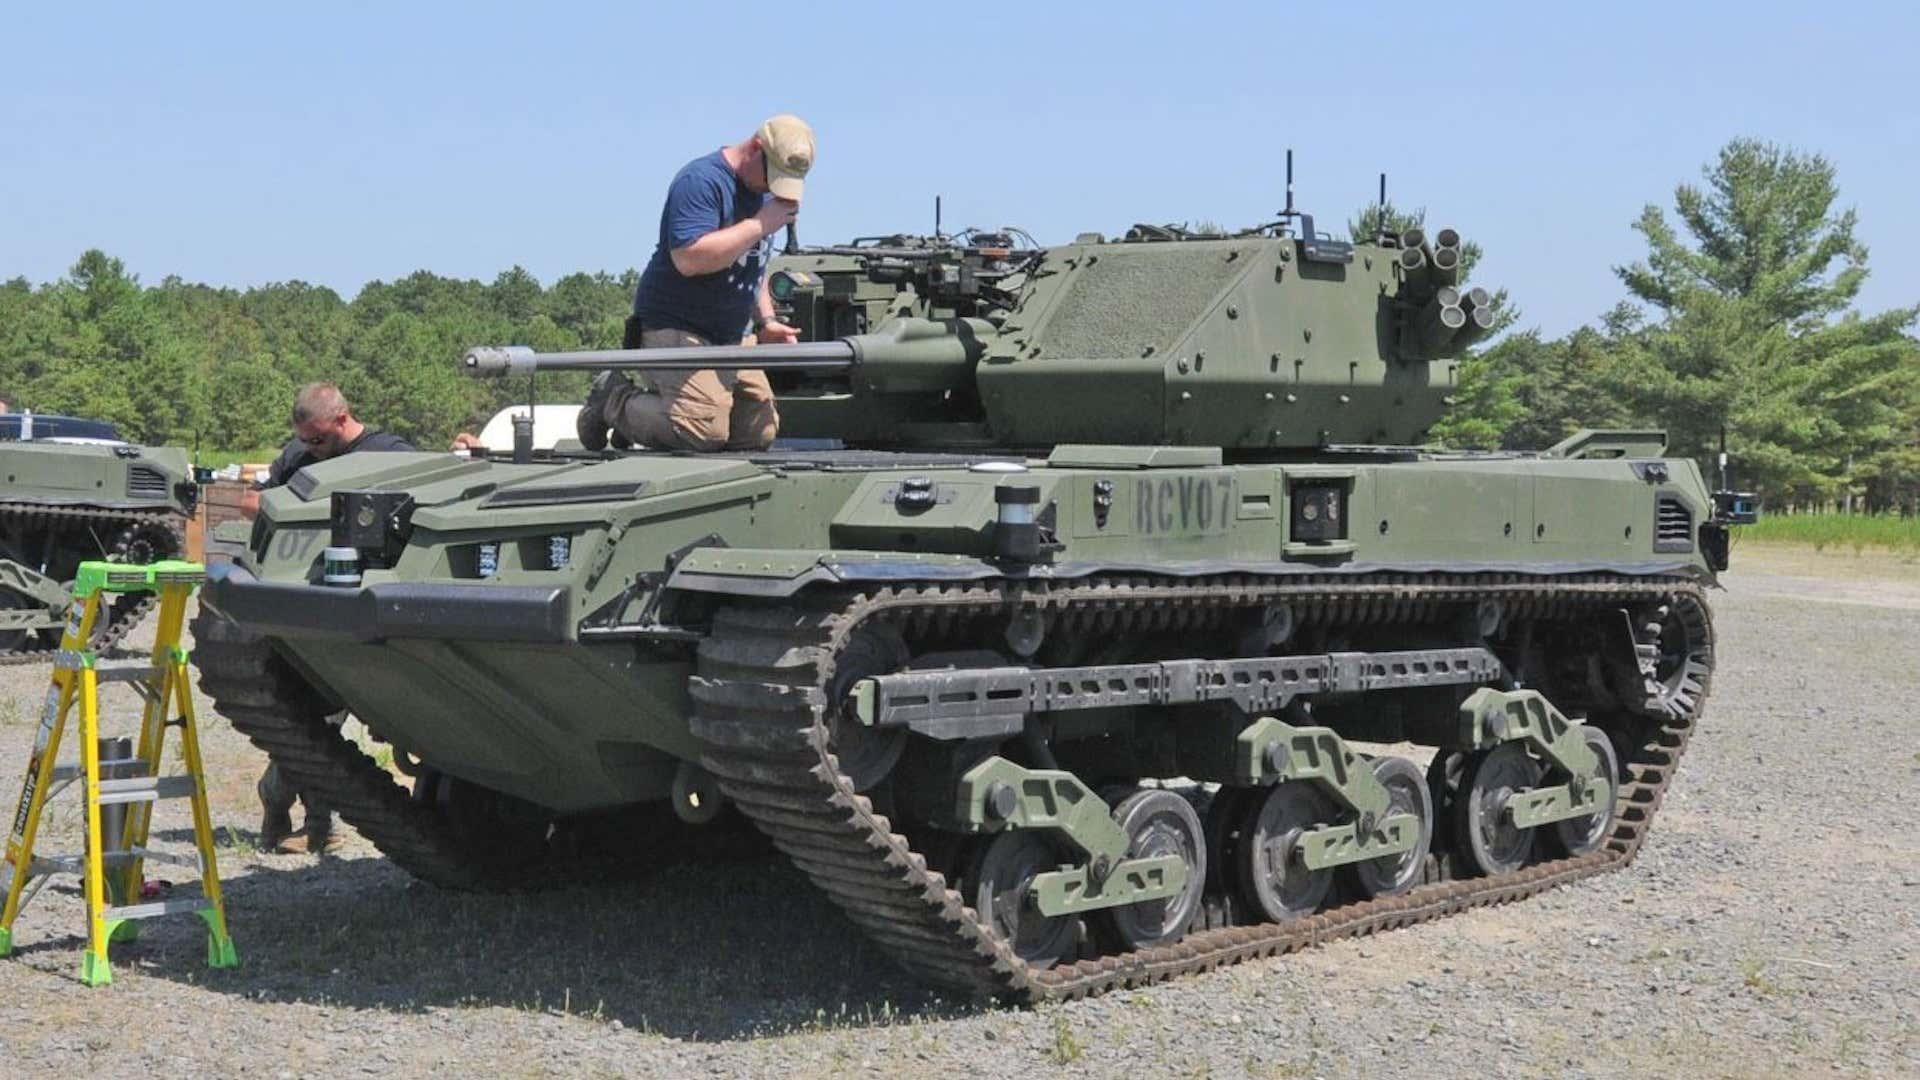 Minitank Ripsaw během testů na Fort Dix. Kredit: US Army.